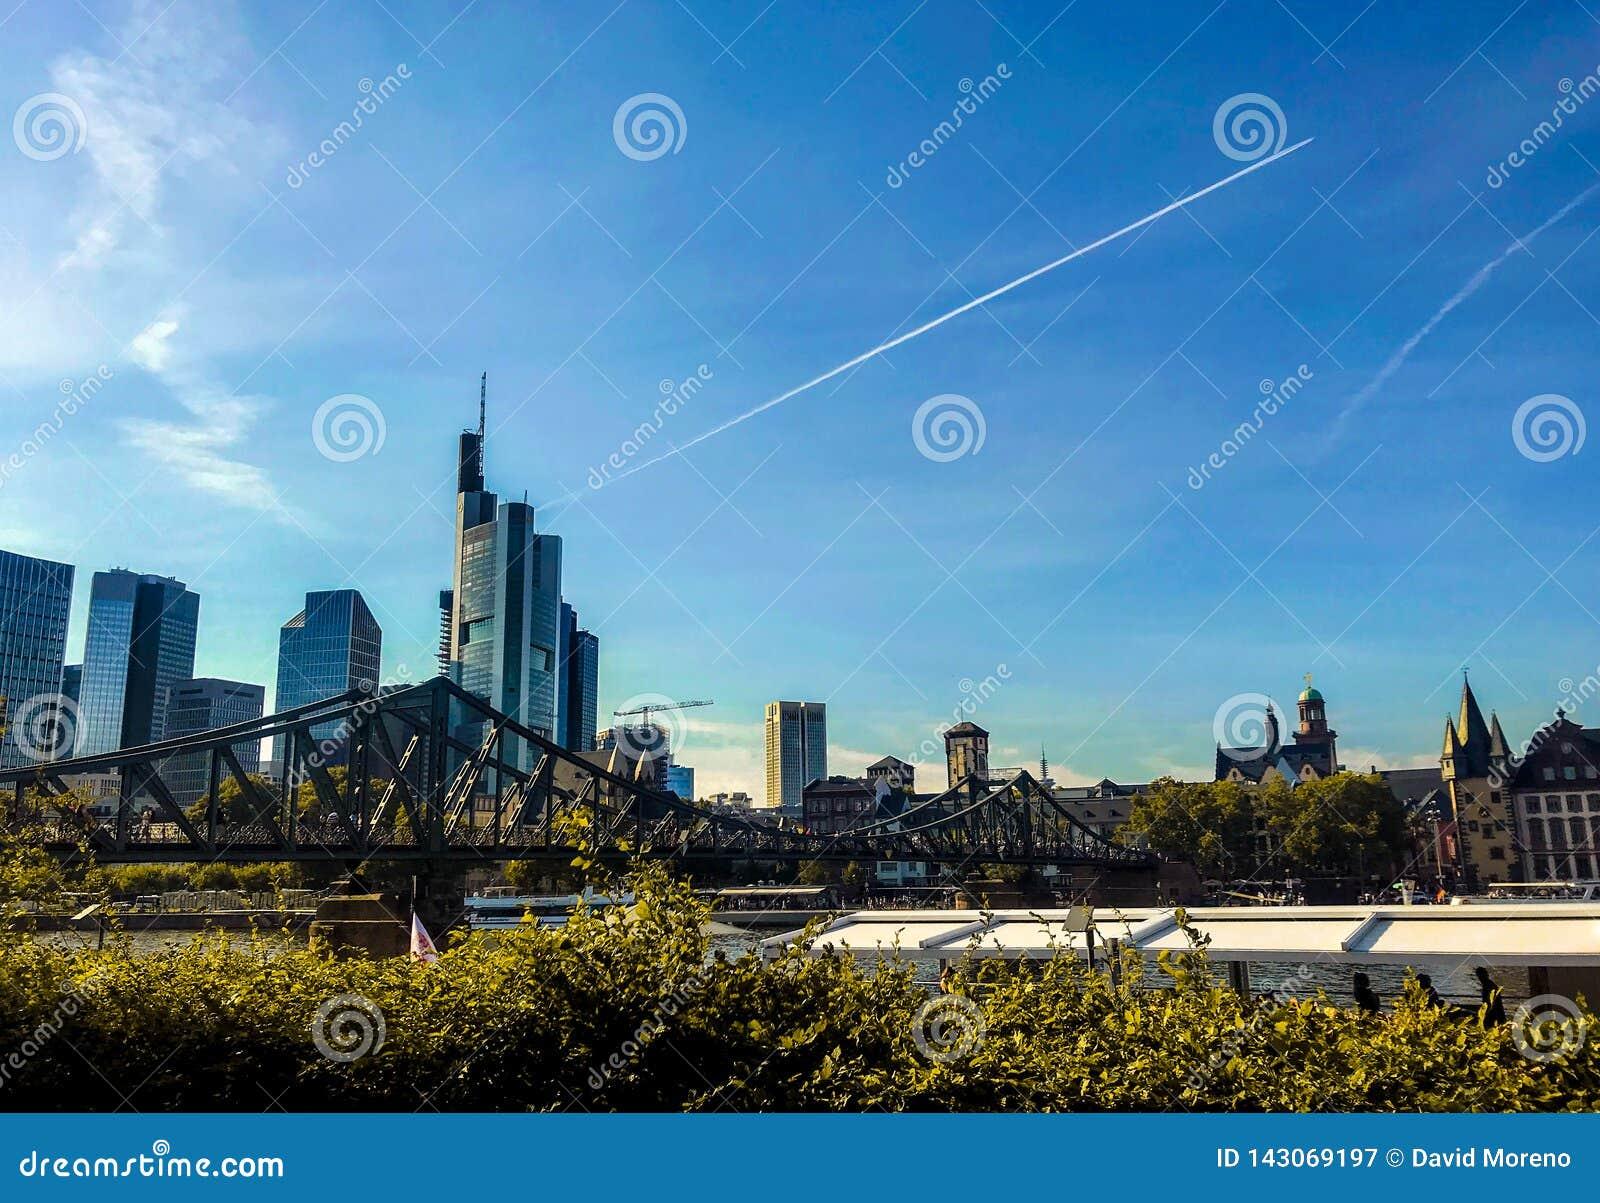 View of the bridge Eiserner Steg crossing the Main river against cityscape of Frankfurt